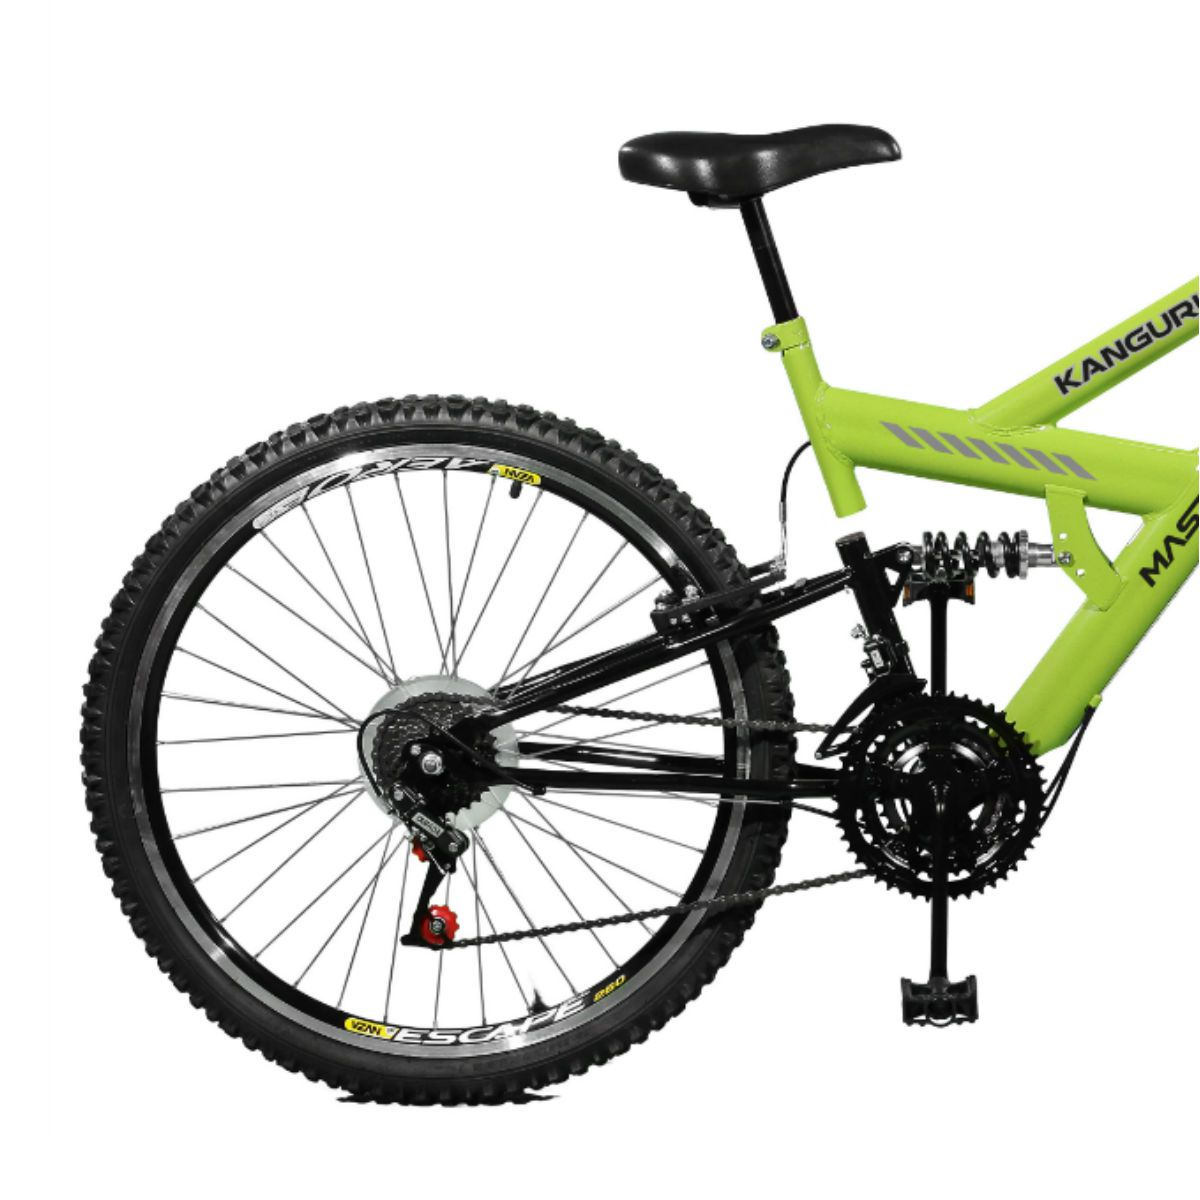 Bicicleta Master Bike Aro 26 Kanguru Style 21 Marchas A-36 V-Brake Verde/Preto